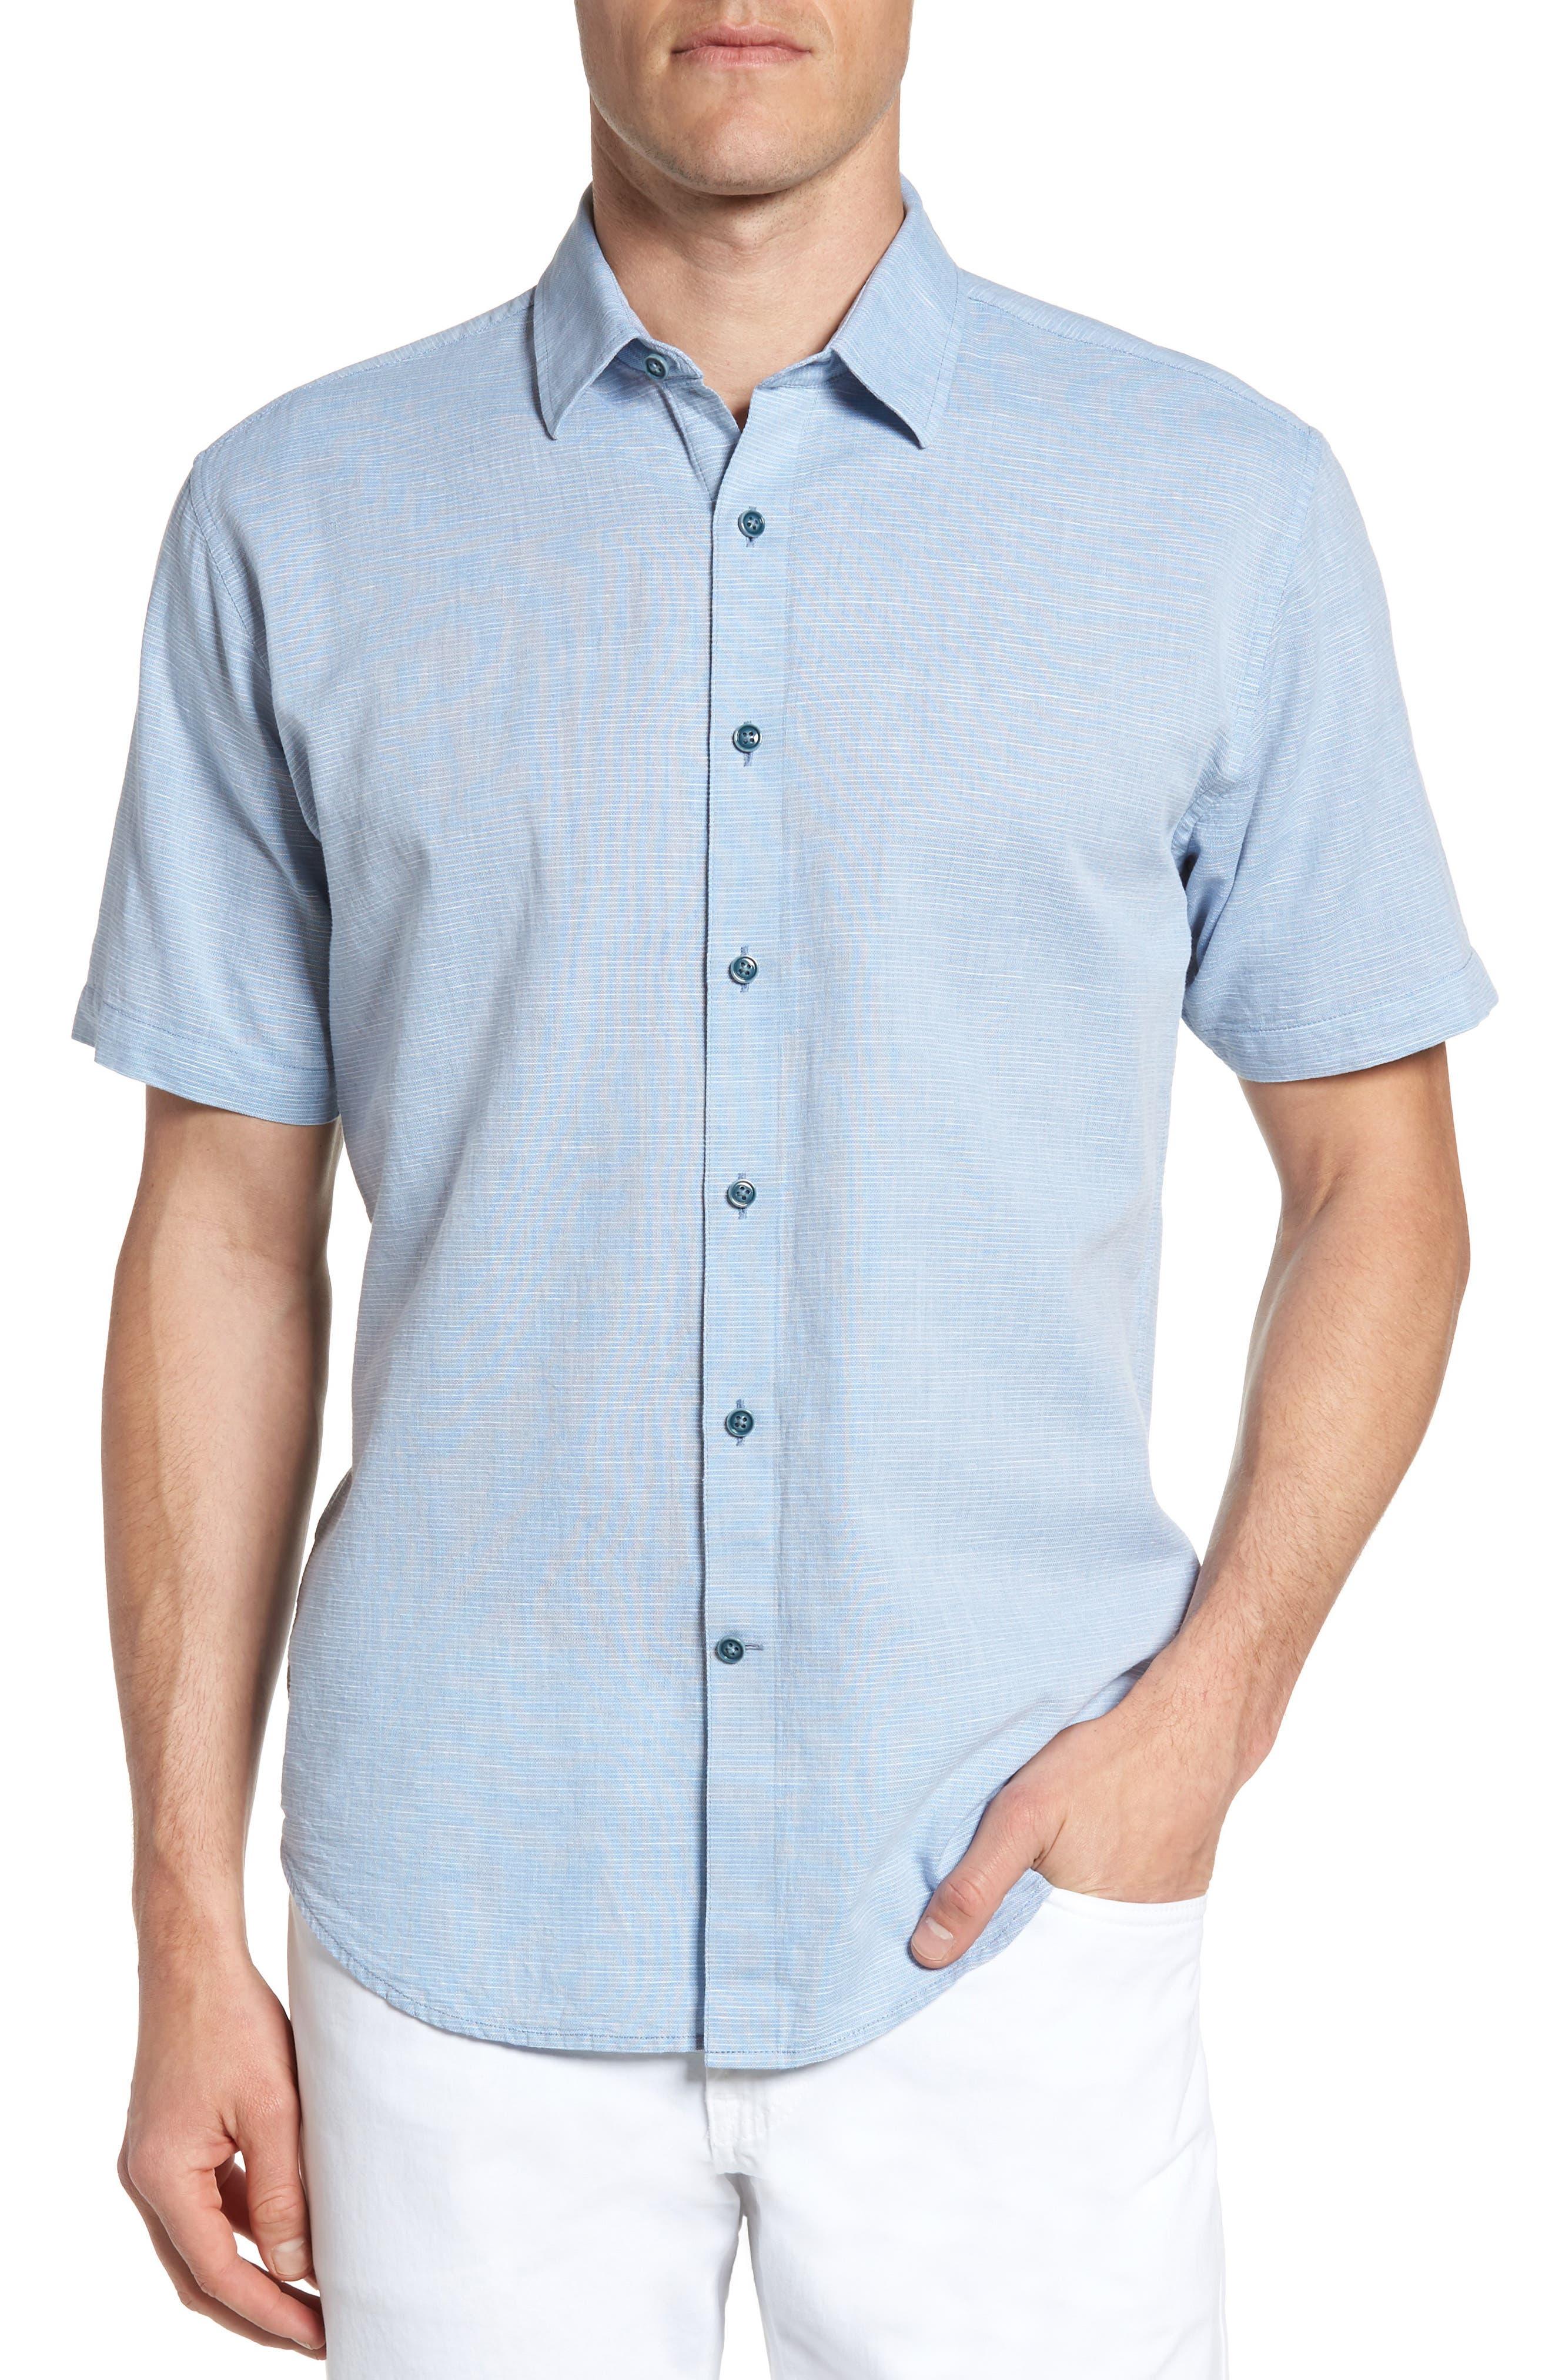 James Campbell 'Ellerbe' Regular Fit Short Sleeve Sport Shirt